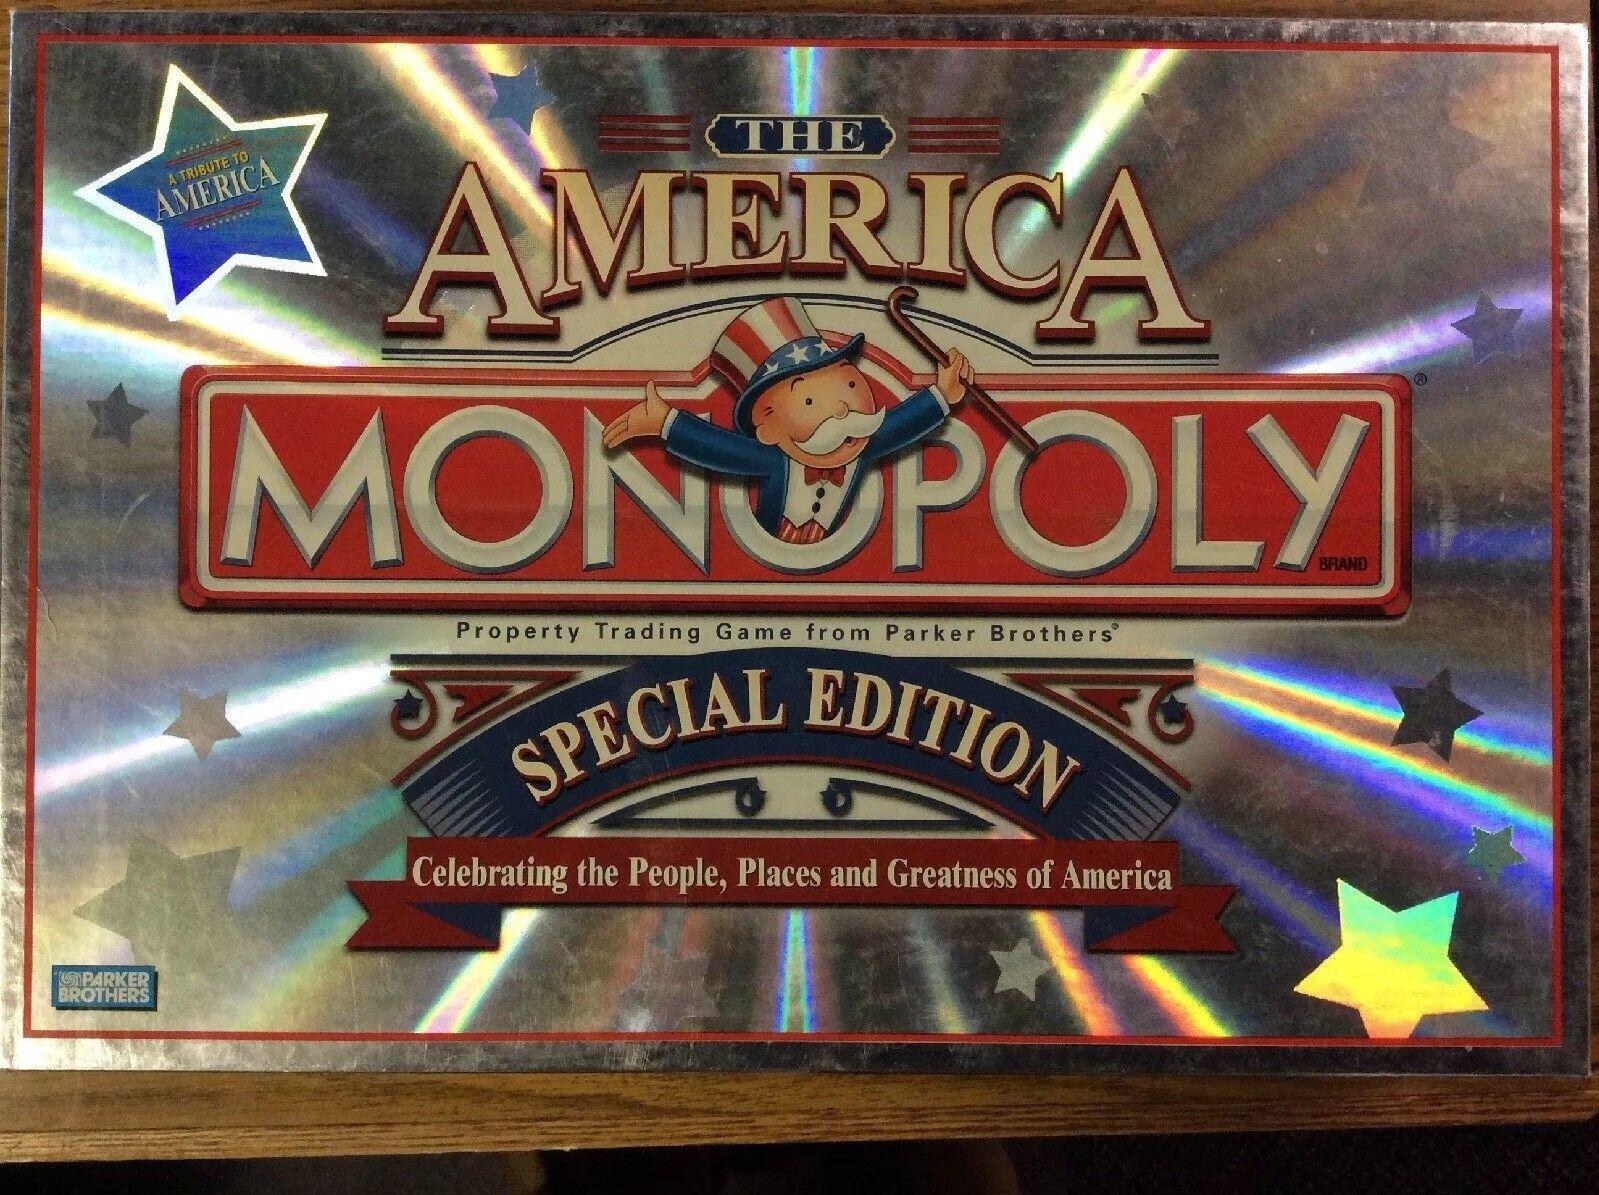 Die einmal amerika - monopol sonderausgabe einmal Die gespielt 2c30c4